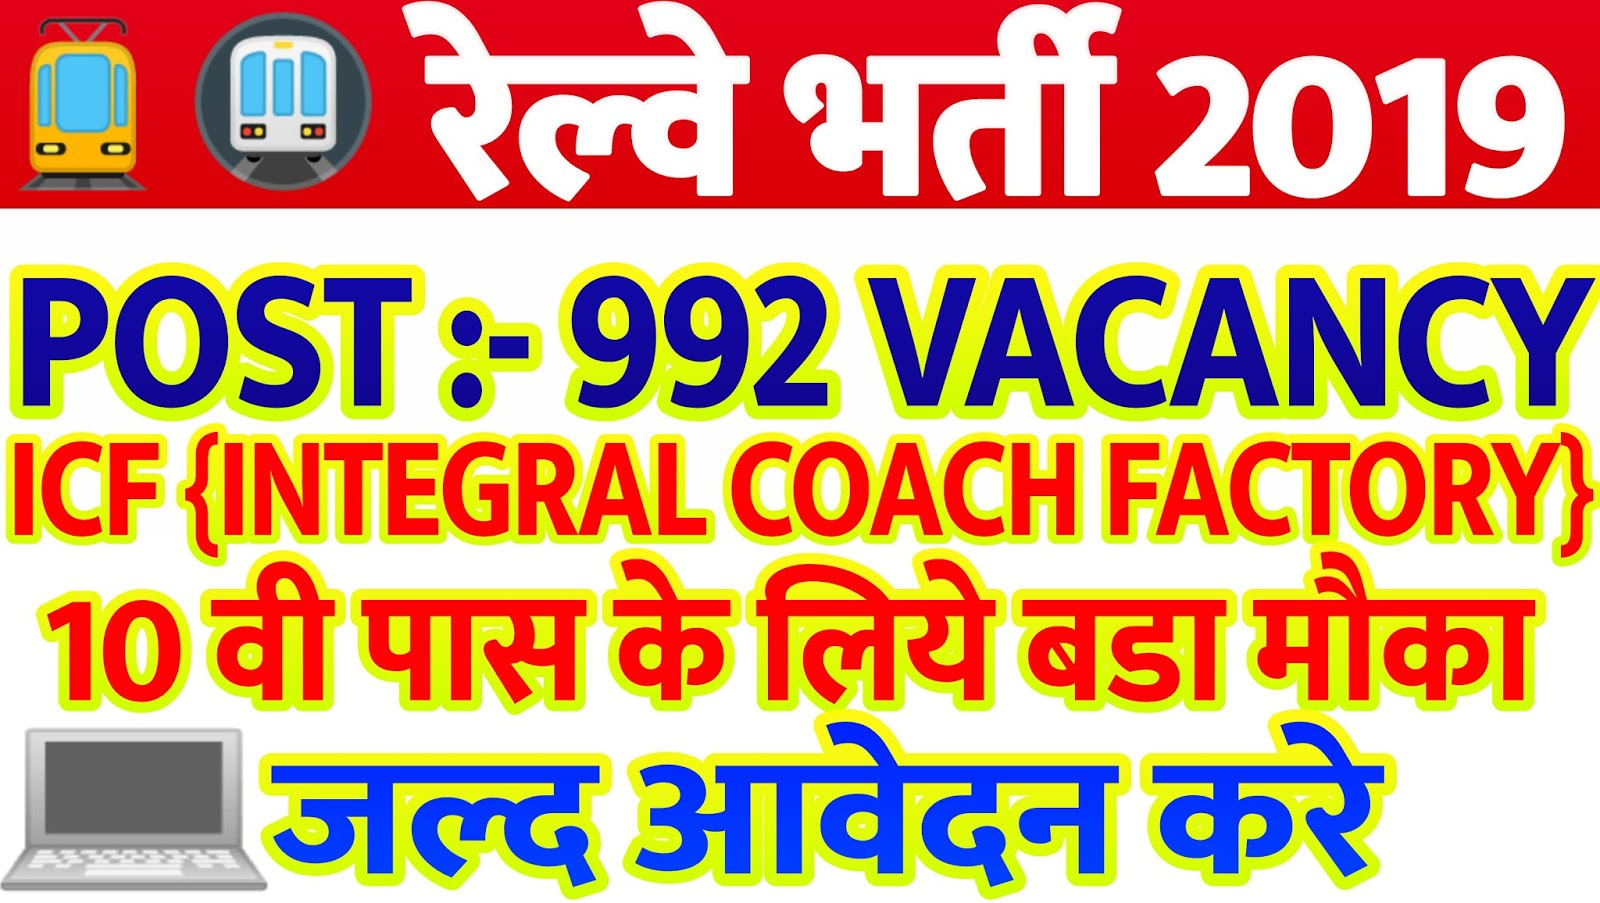 RRB Recruitment 2019: 992 vacancies in ICF - SarkariExamCenter Com